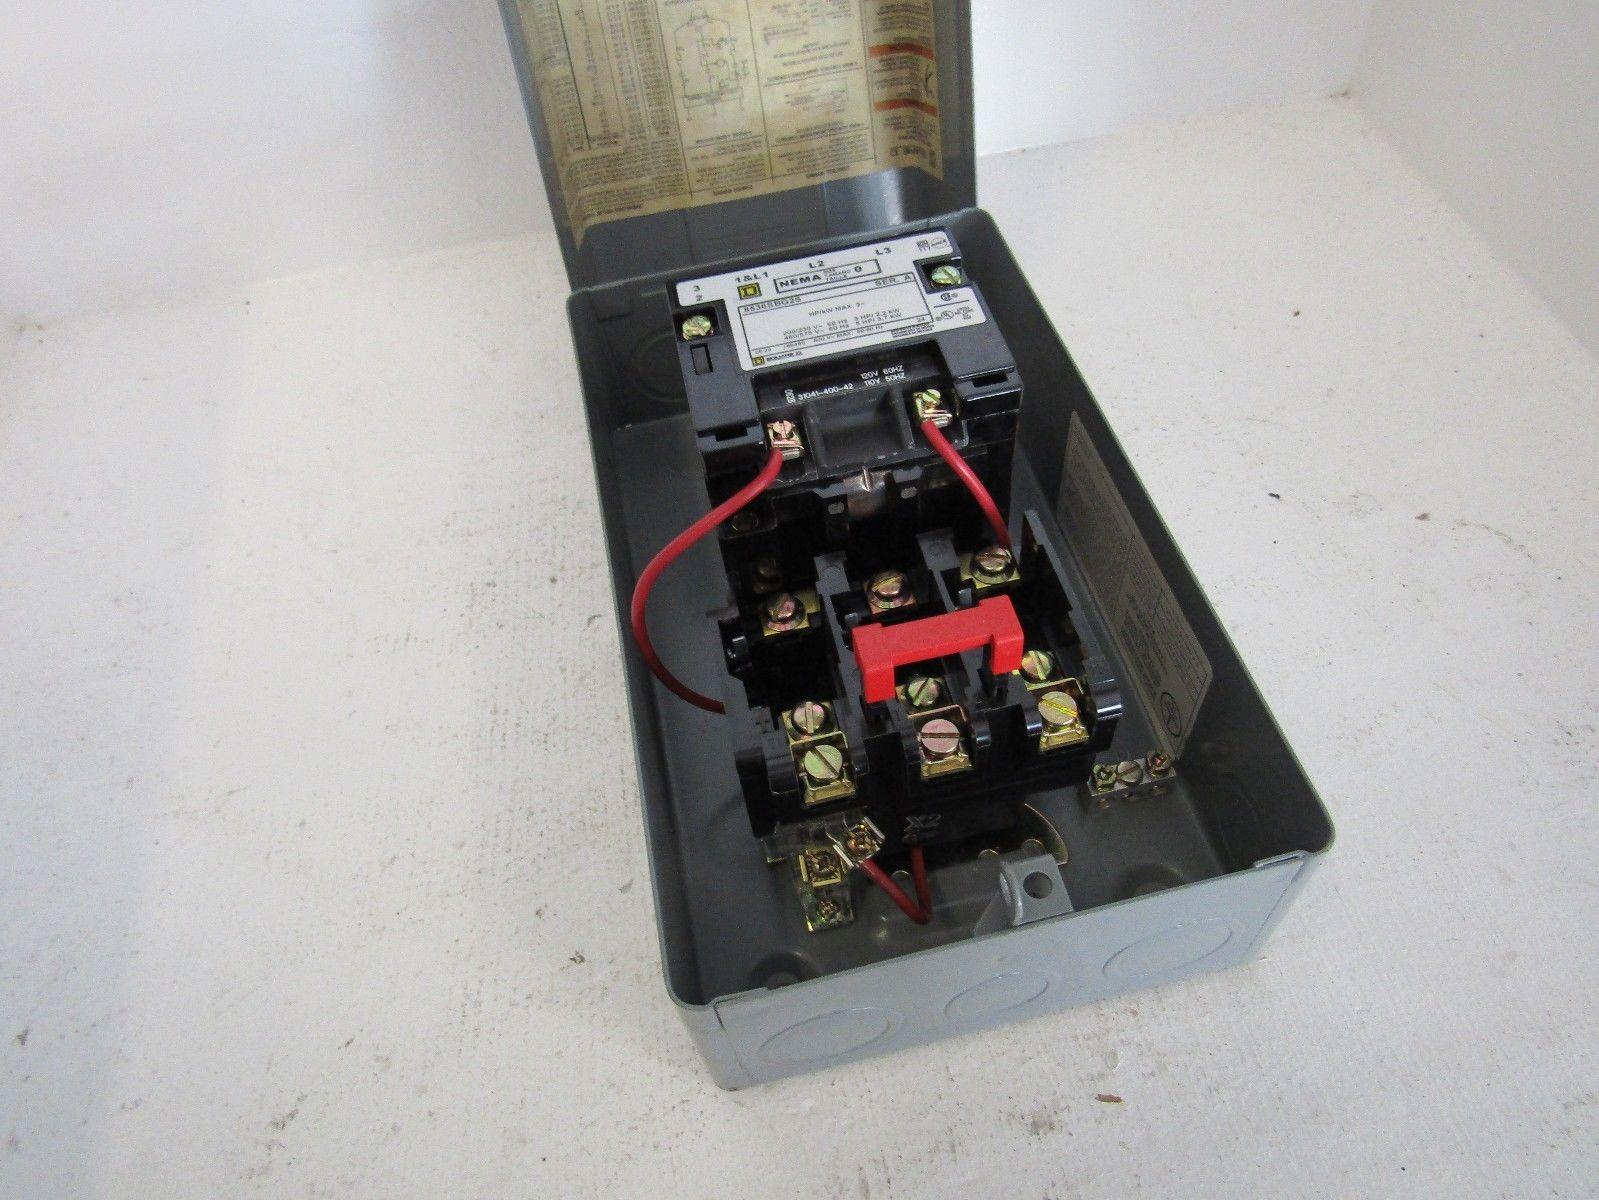 pdf square d motor starter wiring diagram 120 volt coil gallery Square D Schematics  Nema 1 Starter Diagram Square D 8965R010 Wiring Schematic Starter Circuit Wiring Diagram